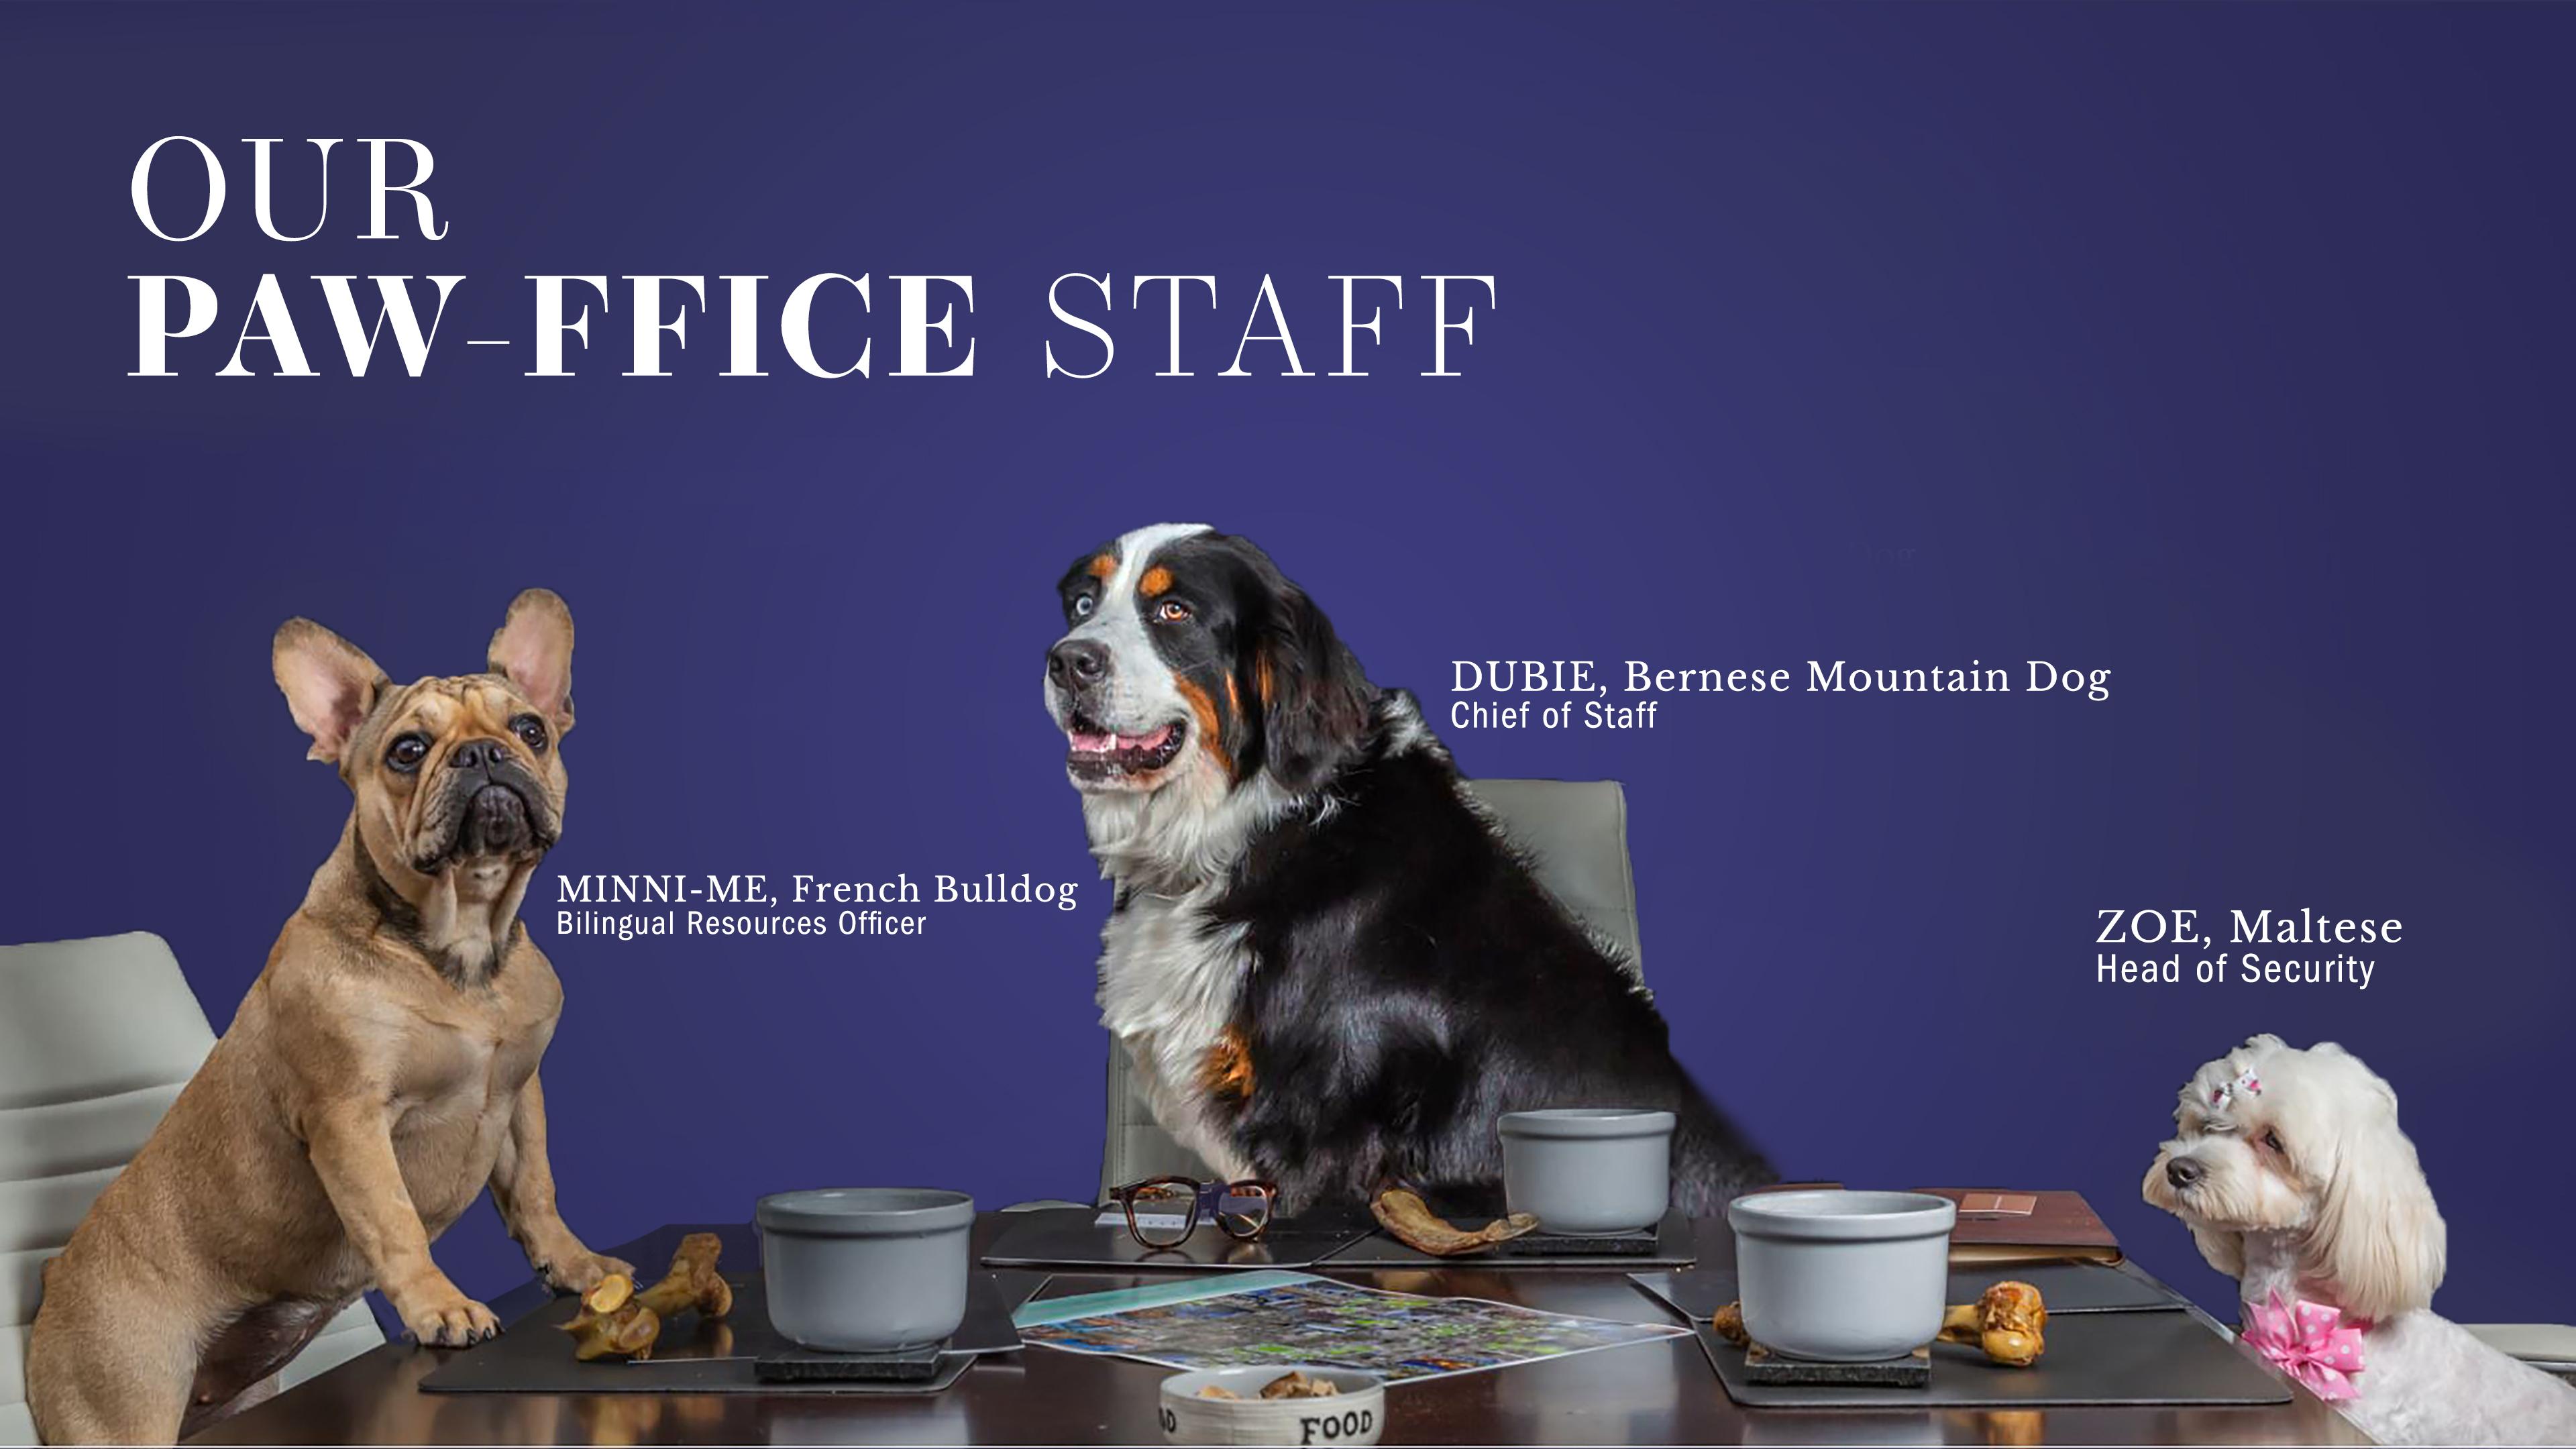 Paw-ffice Staff